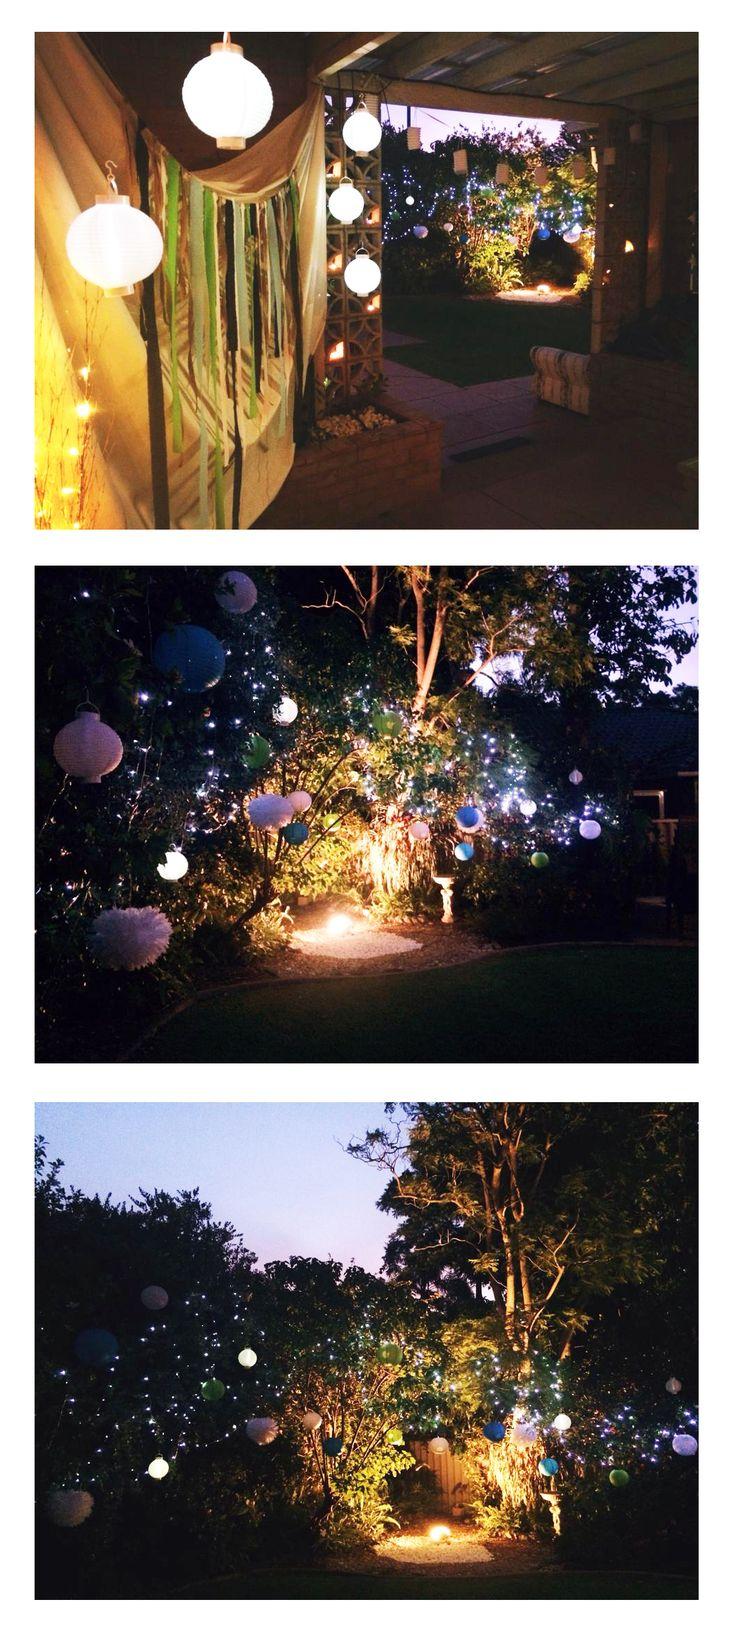 My 21st Birthday, Decorations, Fairy Lights, Paper Lanterns, Flood Light, Backyard, Garden, Party, Night, Lights